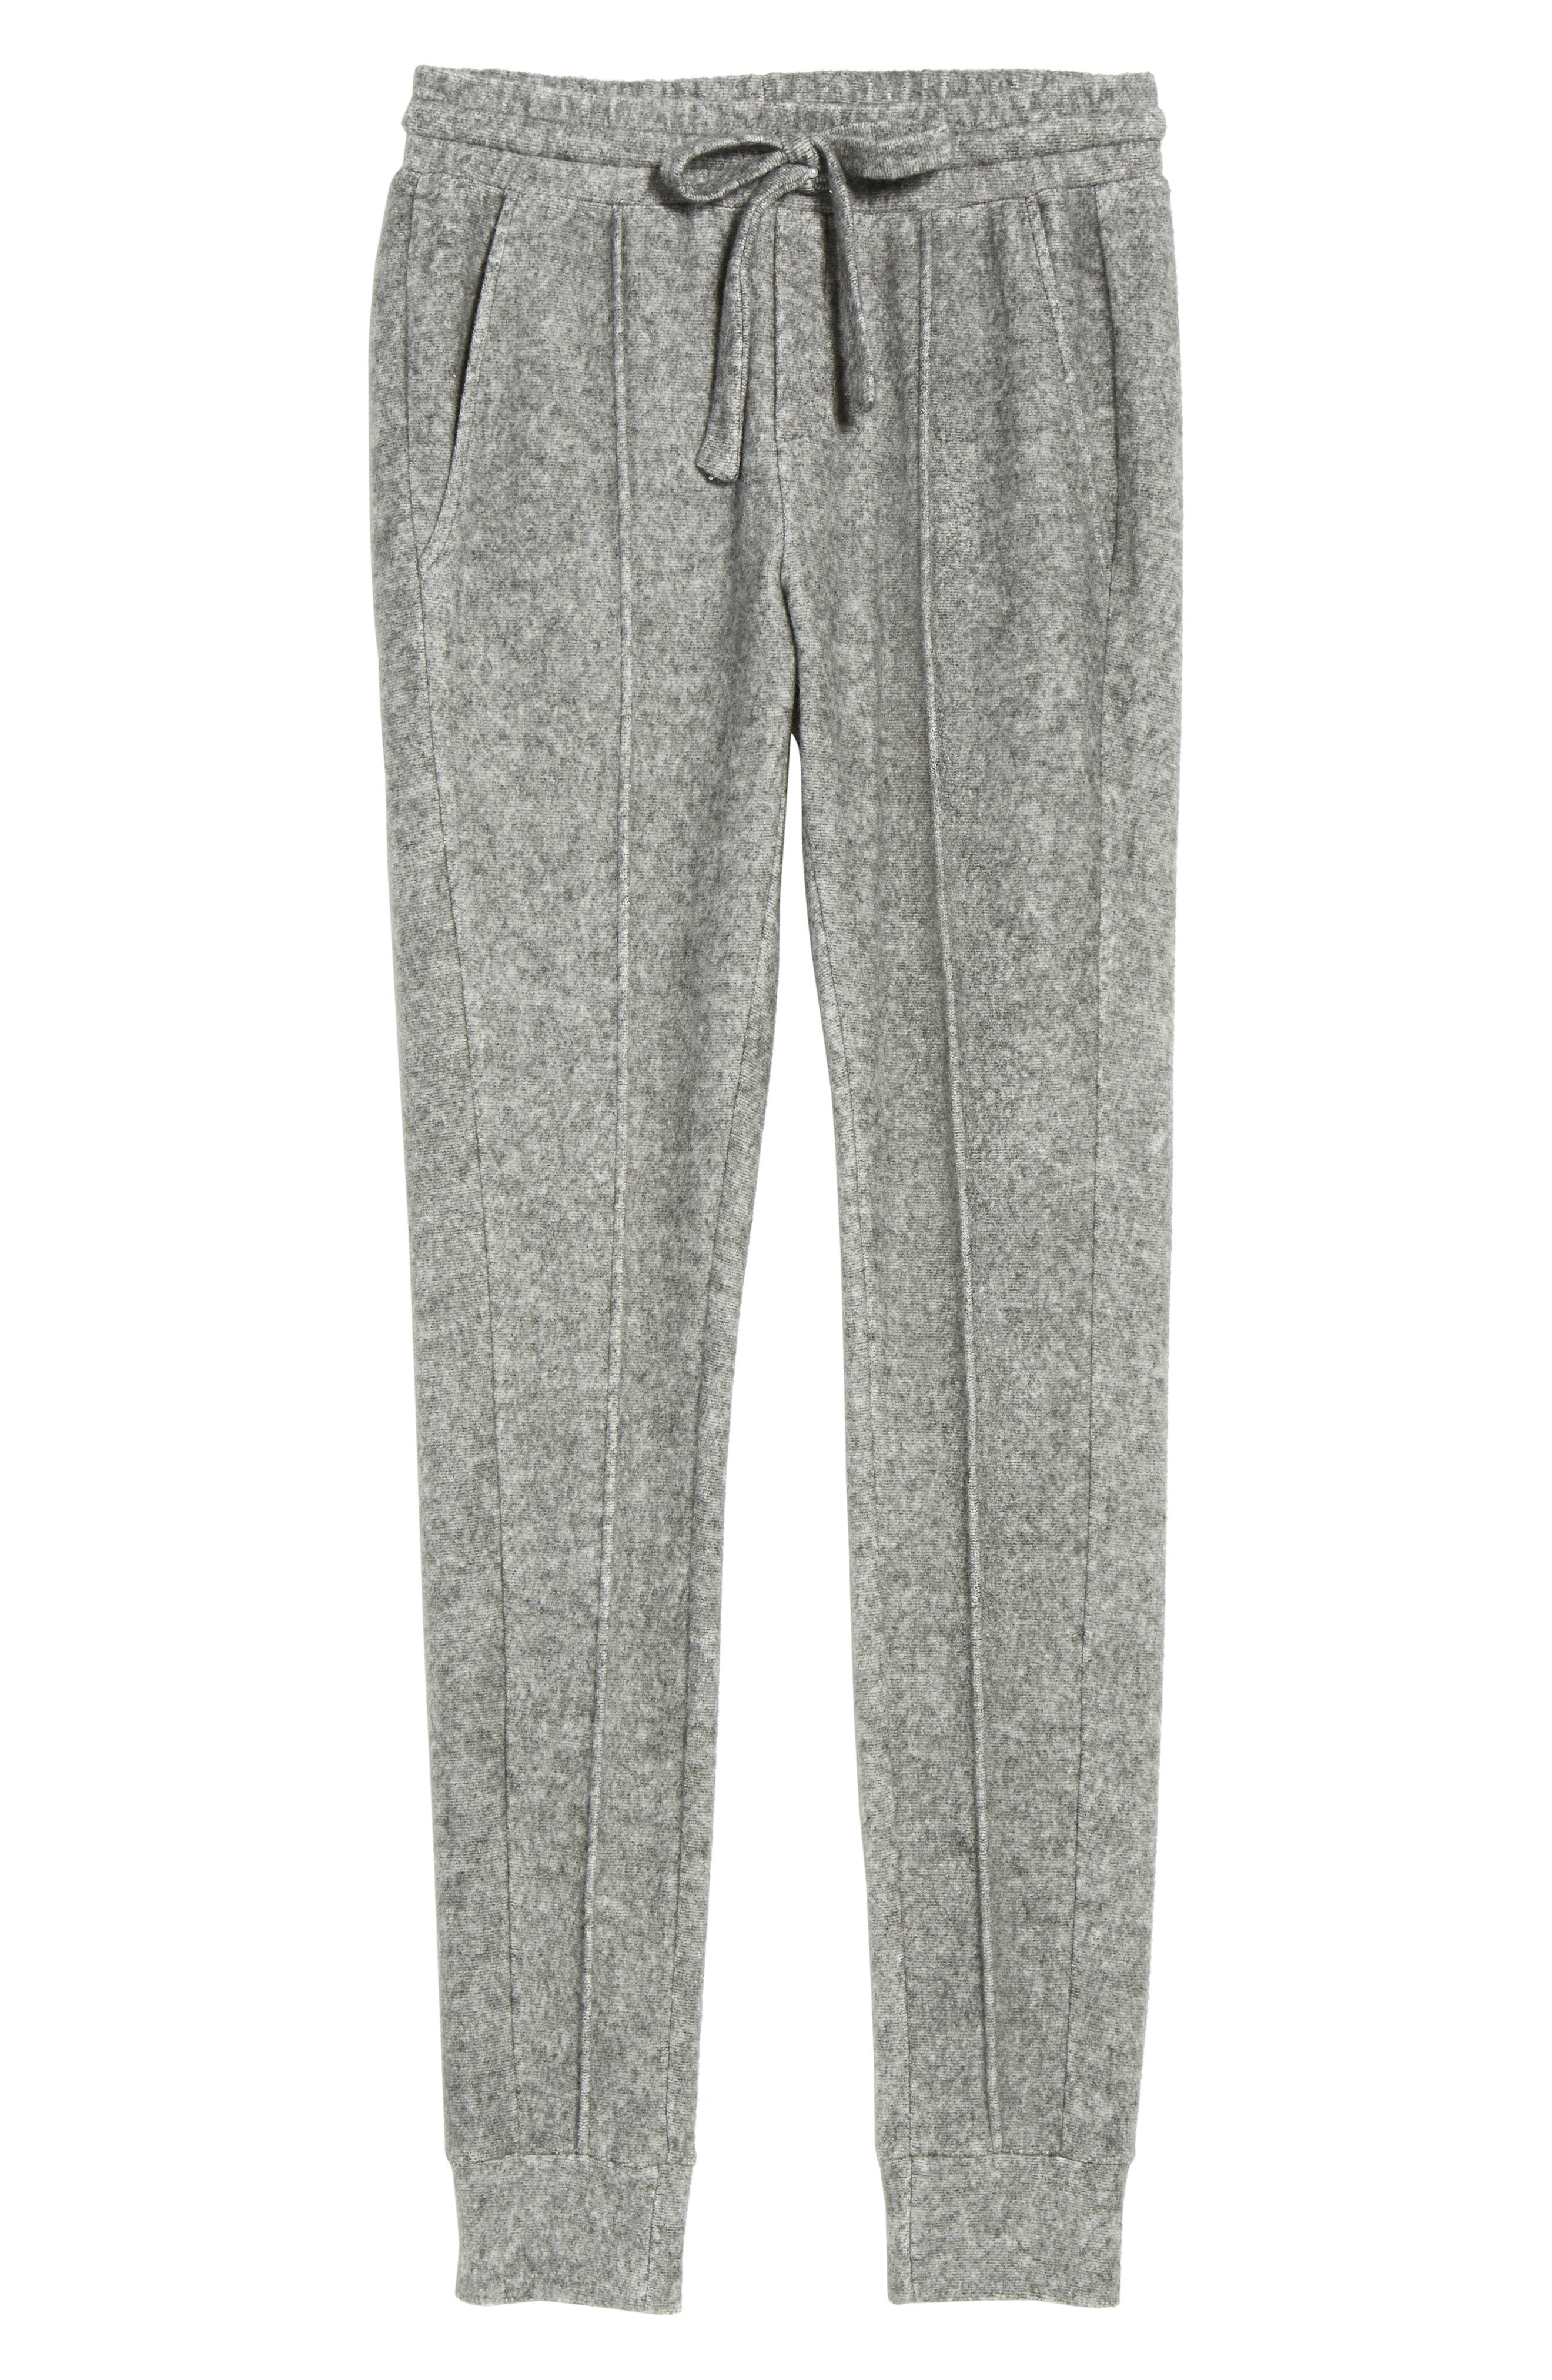 Slim Fleece Jogger Pants,                             Alternate thumbnail 6, color,                             020